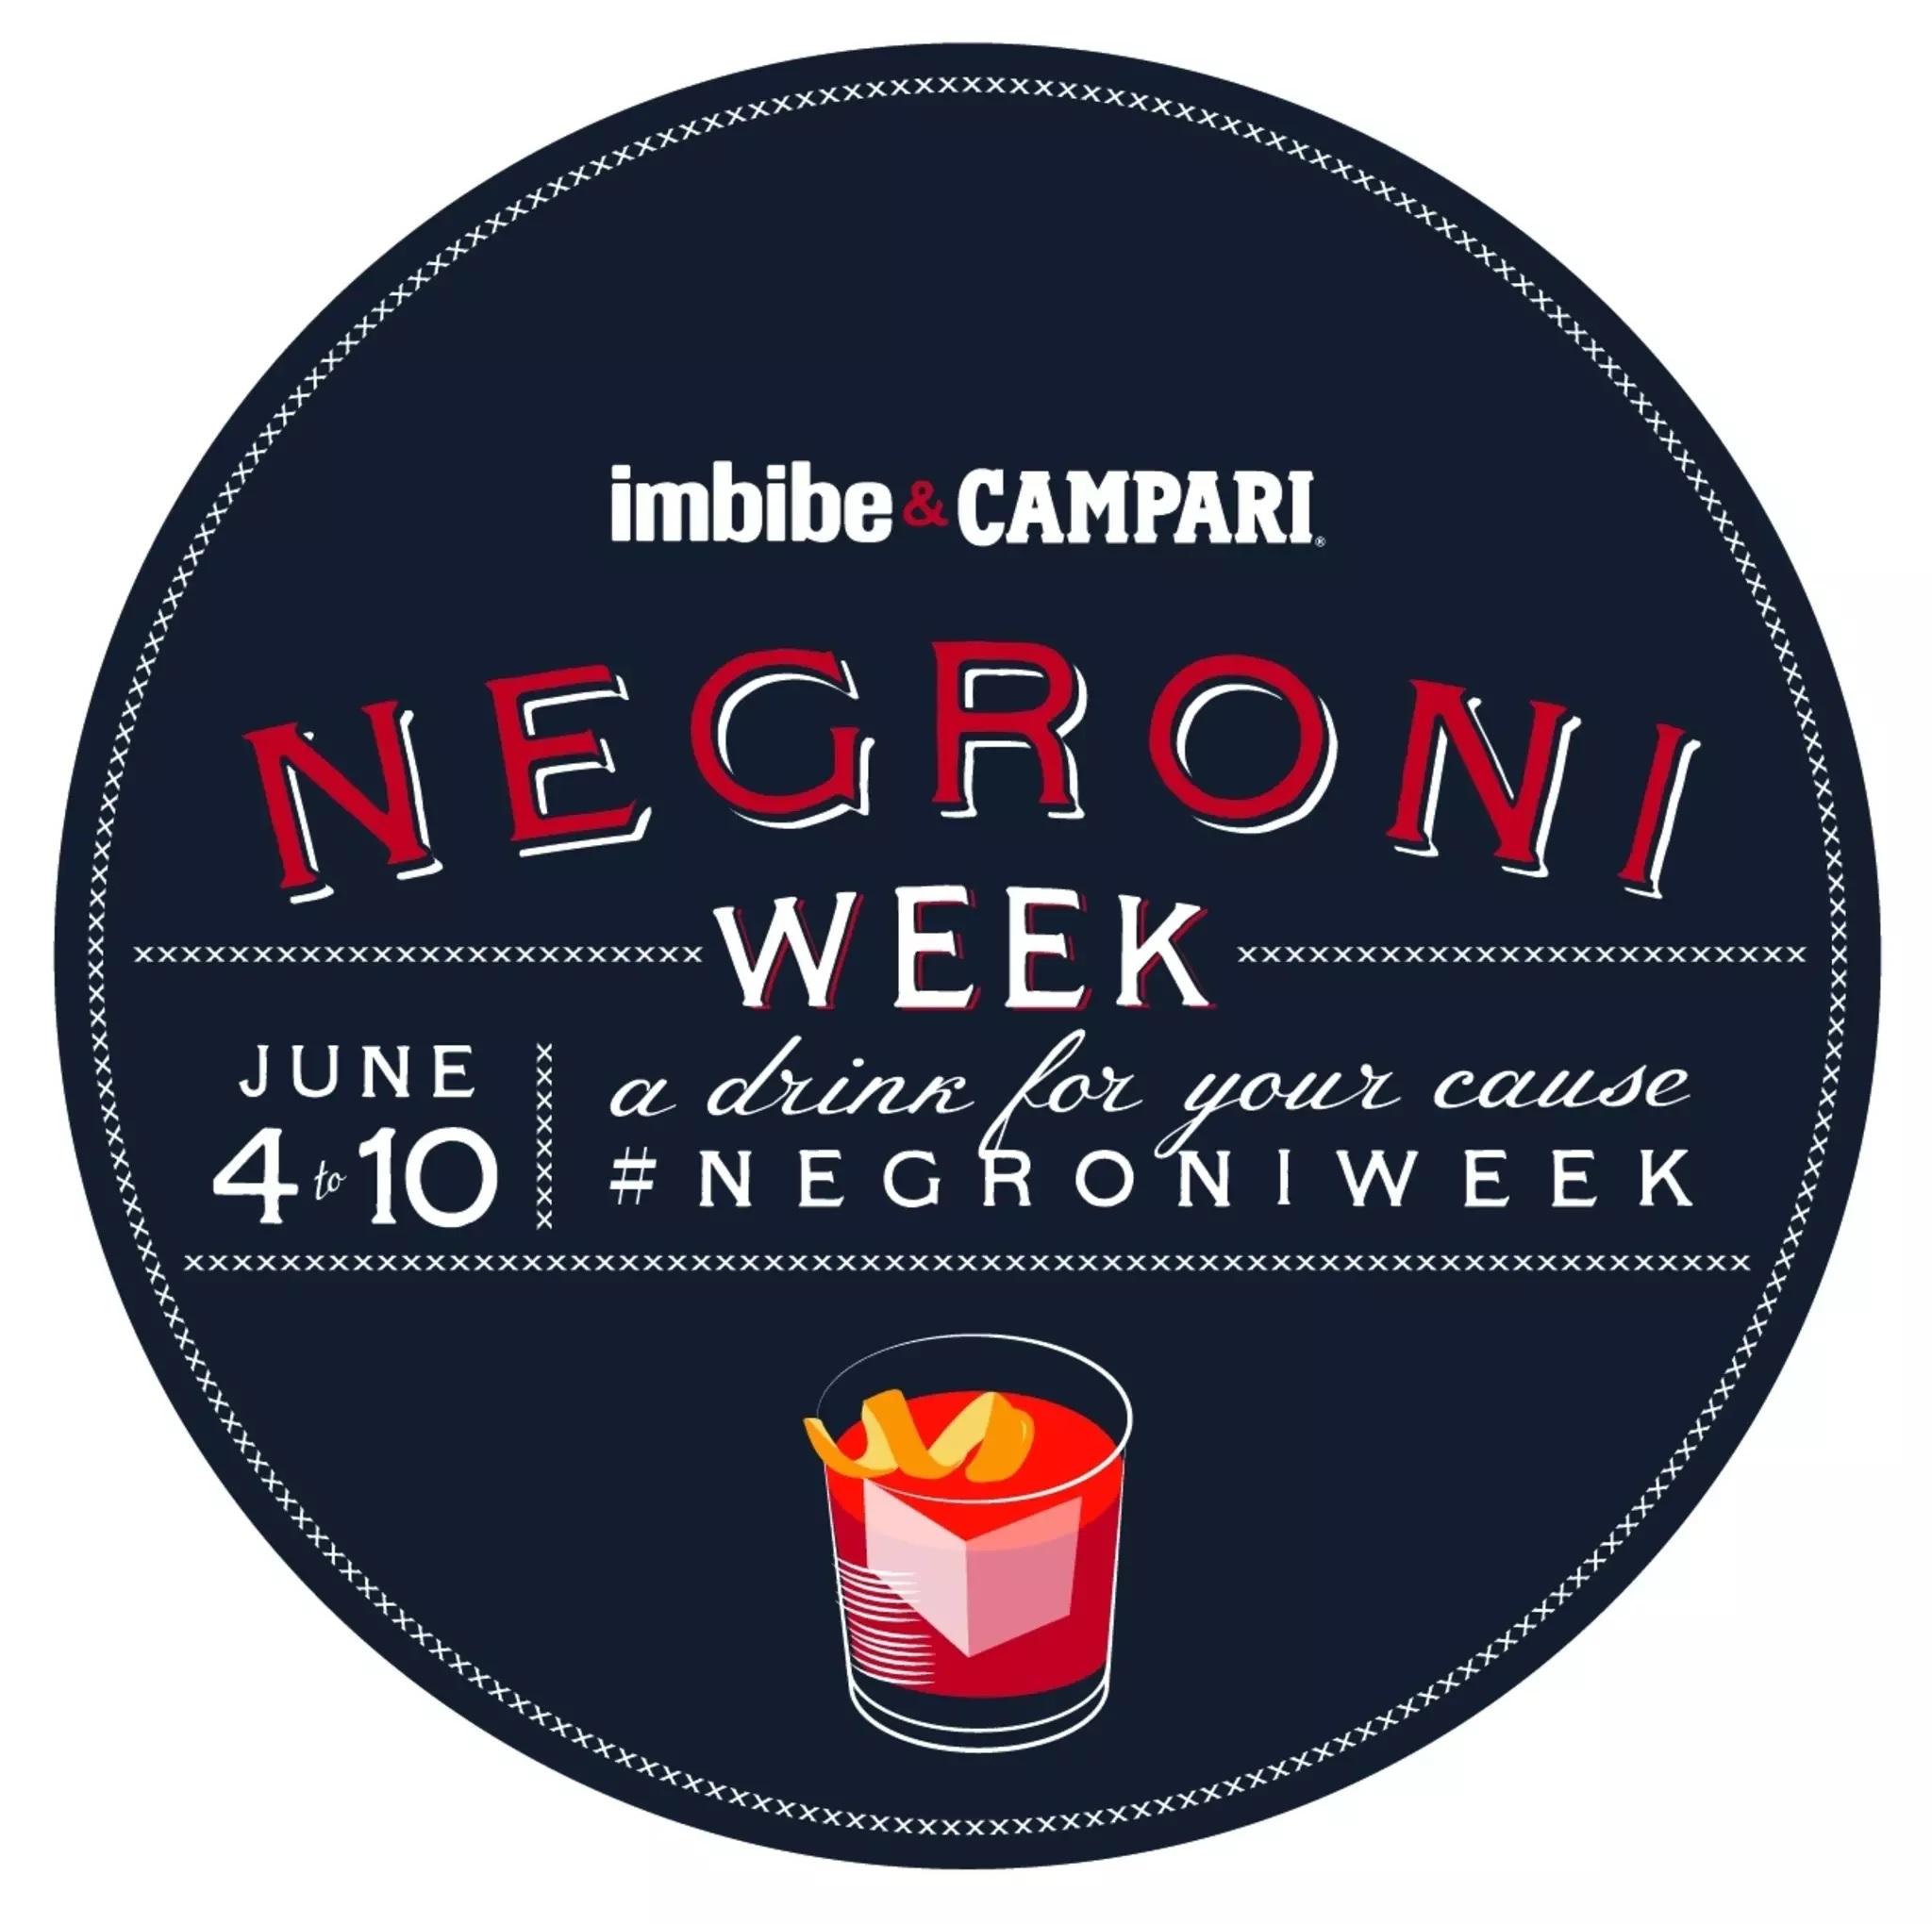 Chile se suma a la gran campaña benéfica de Campari: Negroni Week.